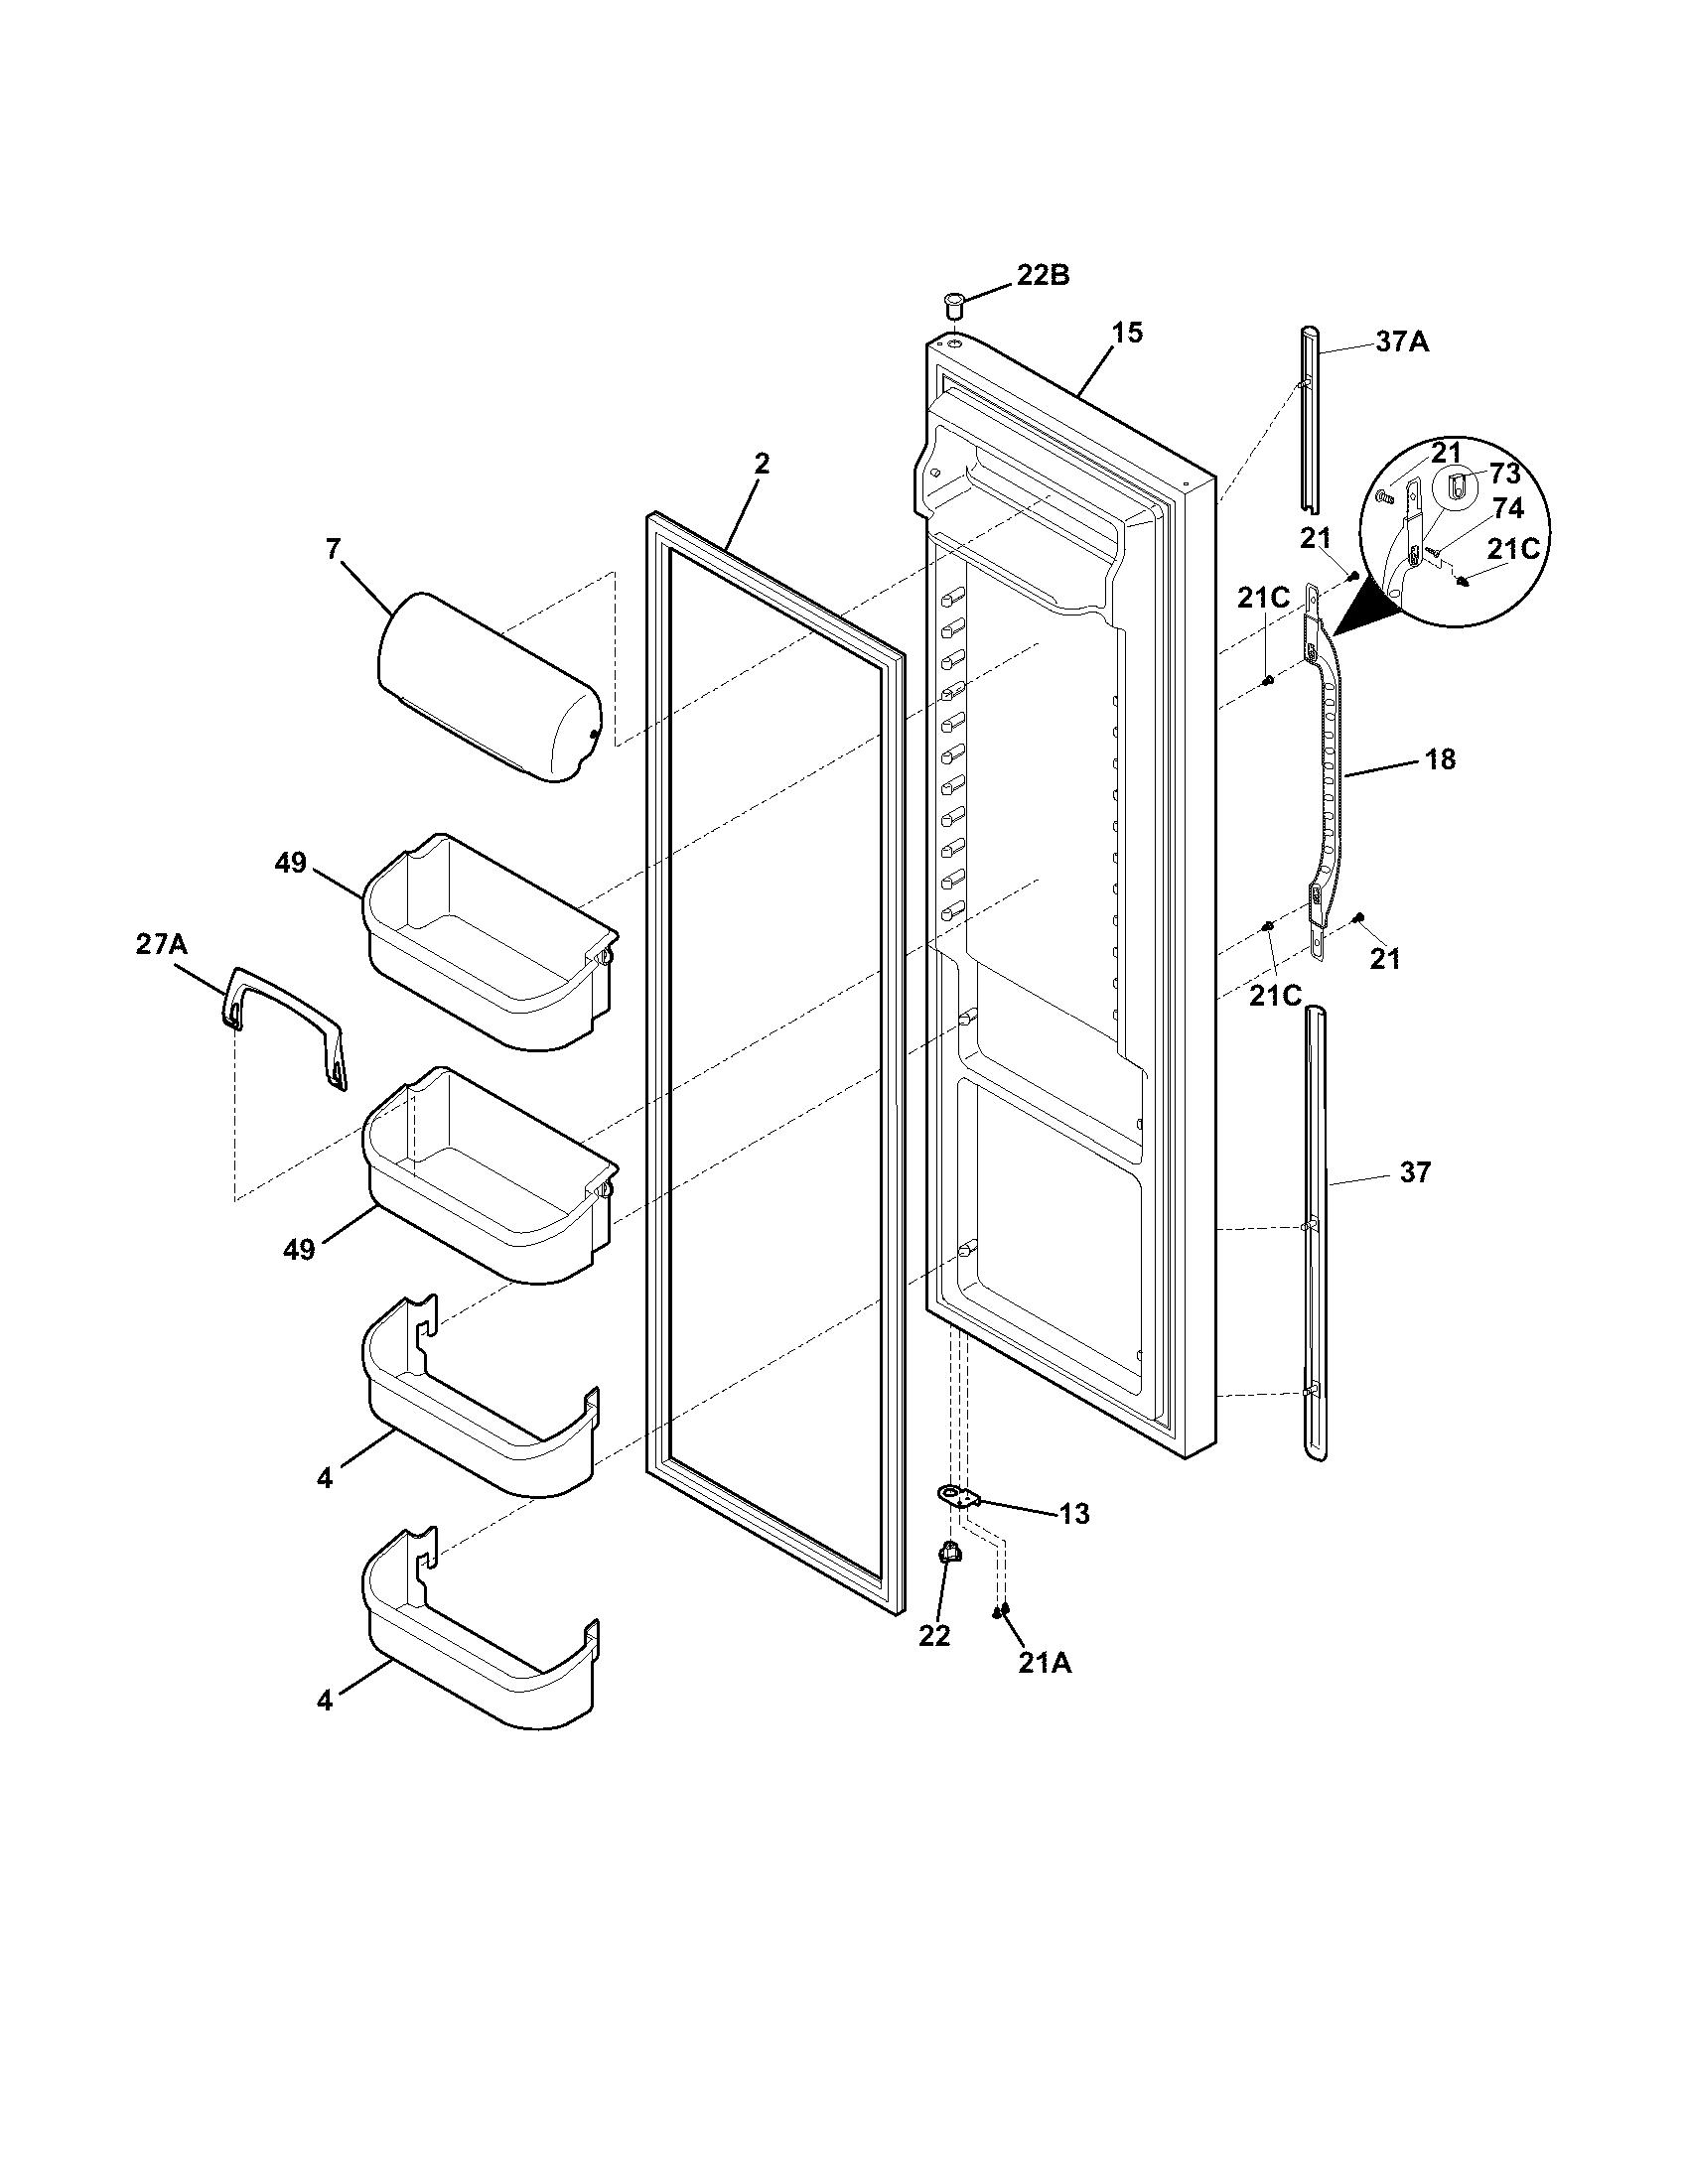 Cabinet Parts Refrigerator Models Kitchen Appliances Layout